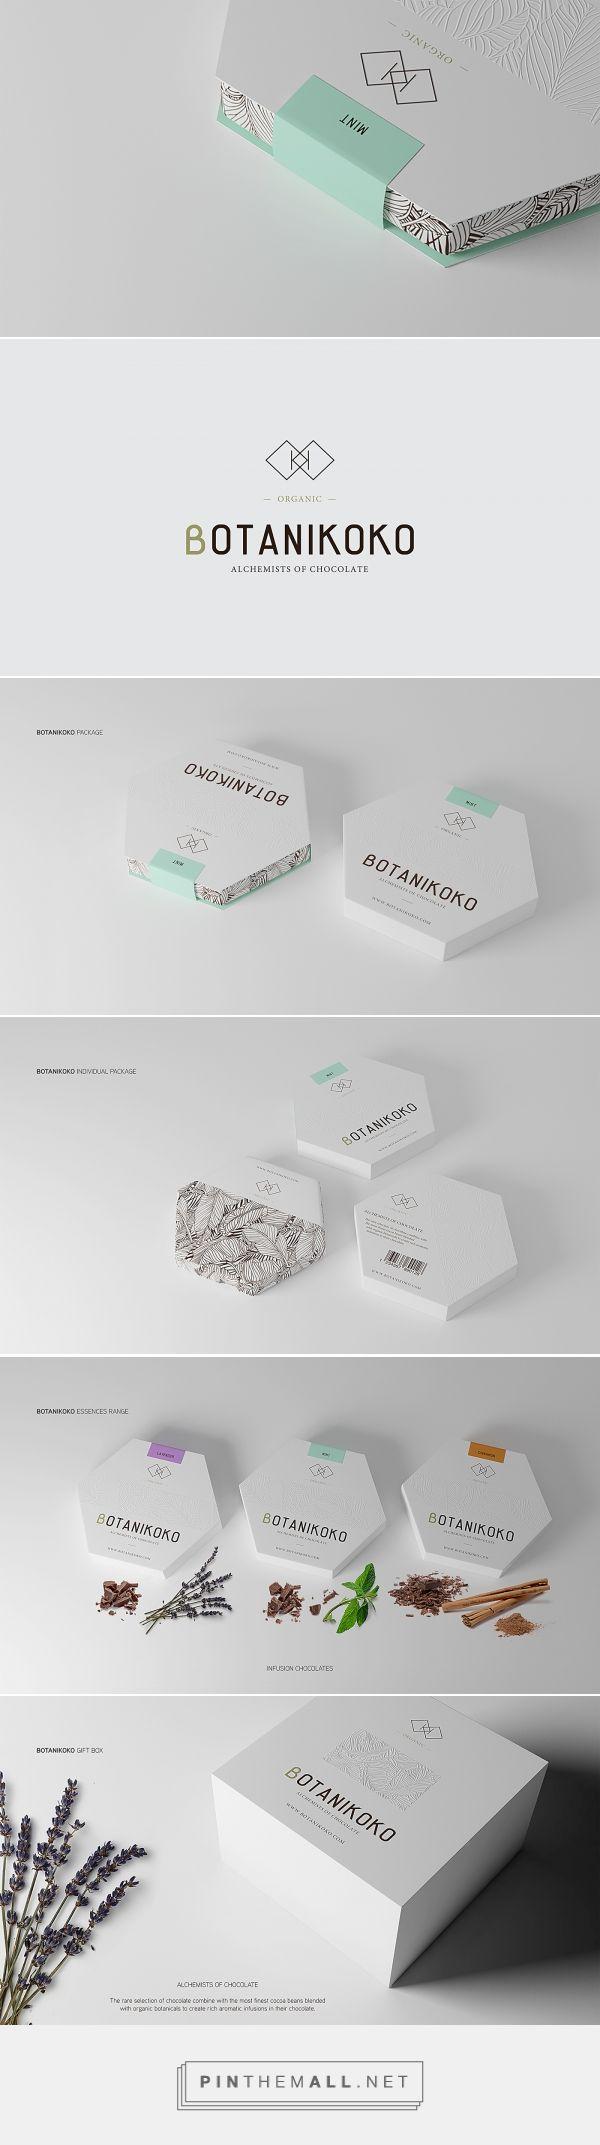 BOTANIKOKO Chocolate Packaging by Pedro Sousa | Fivestar Branding Agency – Design and Branding Agency & Curated Inspiration Gallery #chocolatepackaging #packaging #packagingdesign #packagedesign #design #designinspiration